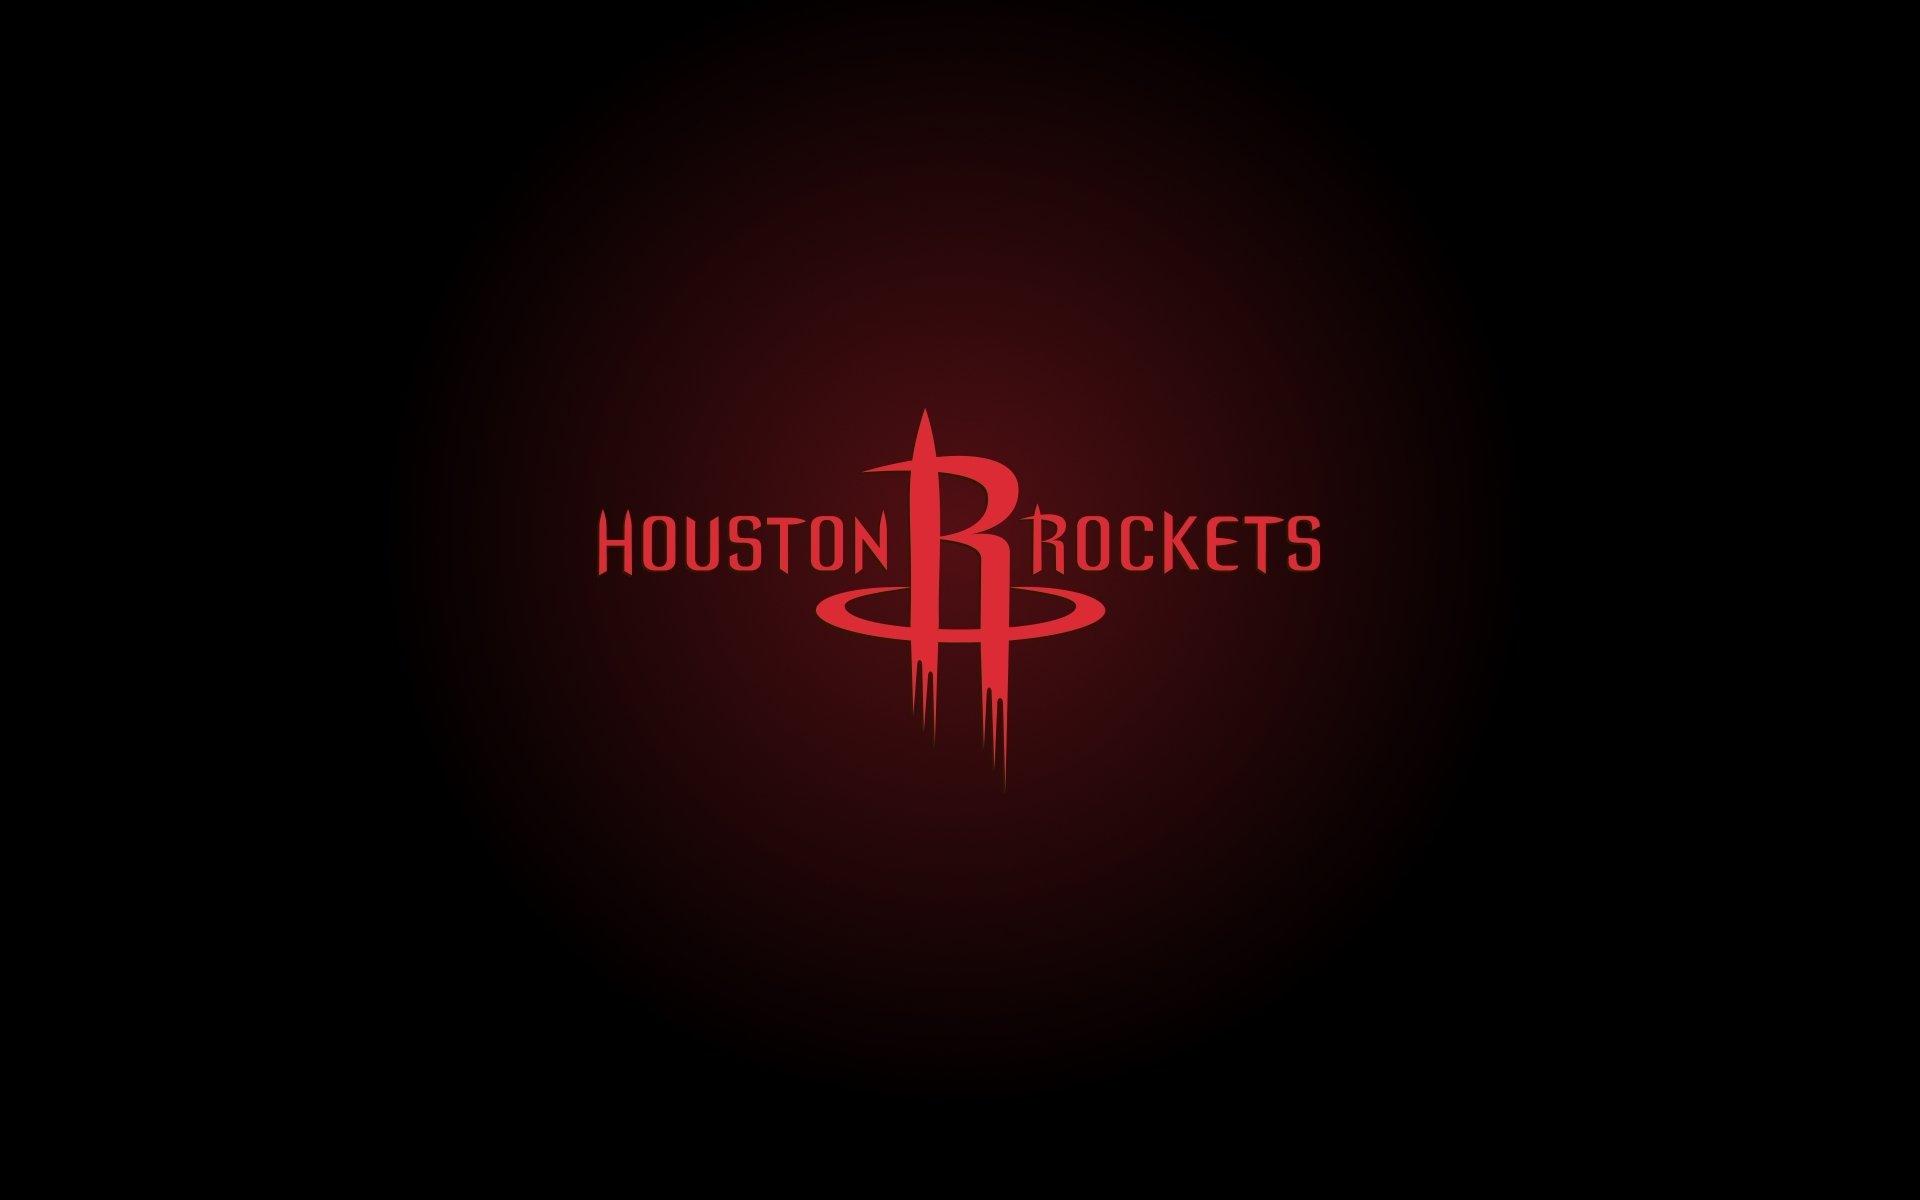 Houston Rockets Fondo De Pantalla Hd Fondo De Escritorio